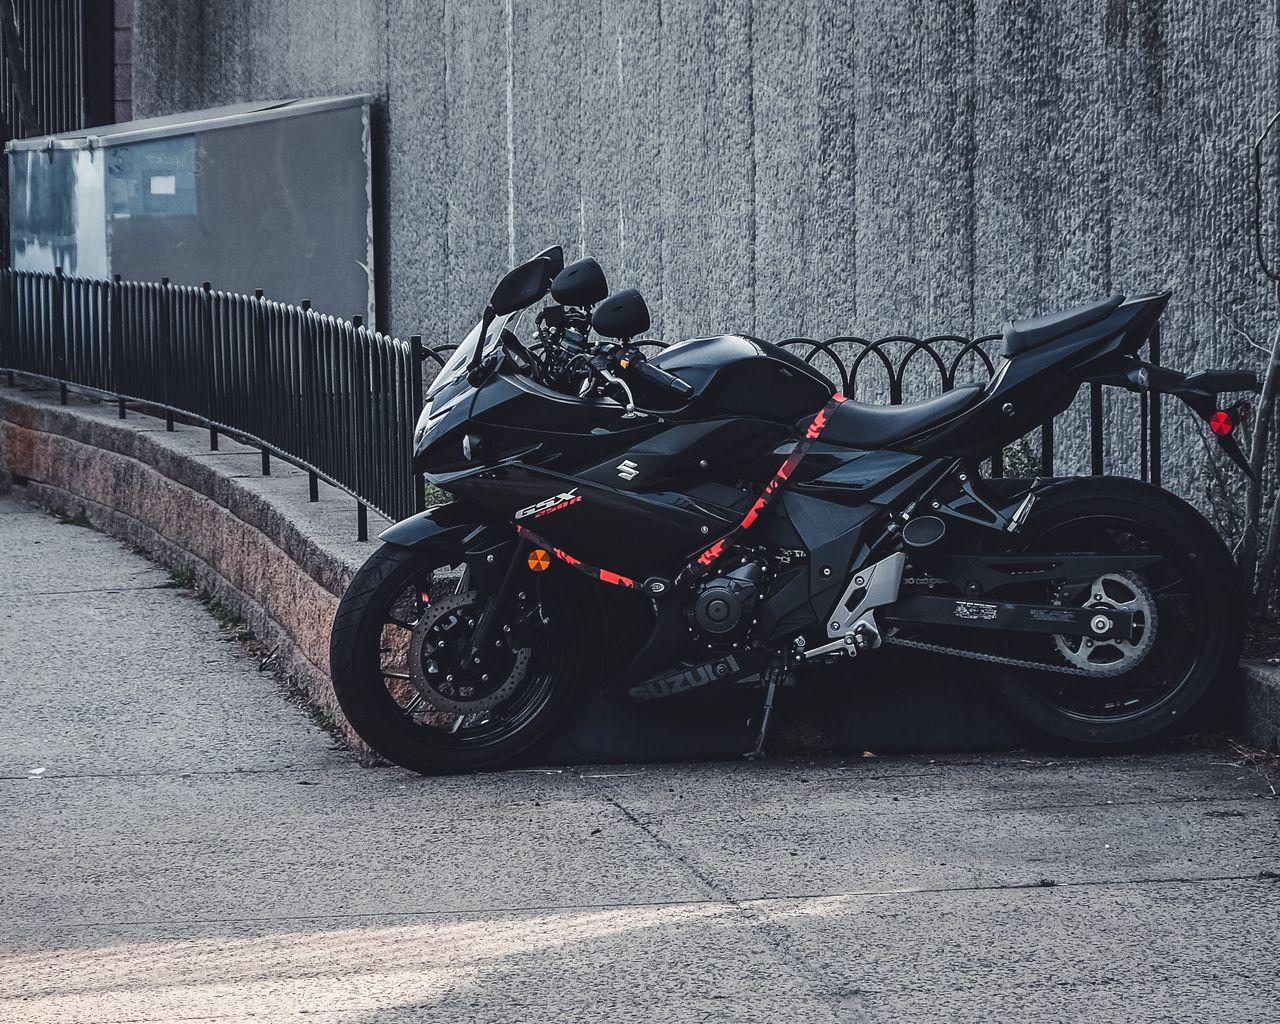 1280x1024 Wallpaper suzuki, motorcycle, bike, black, parking